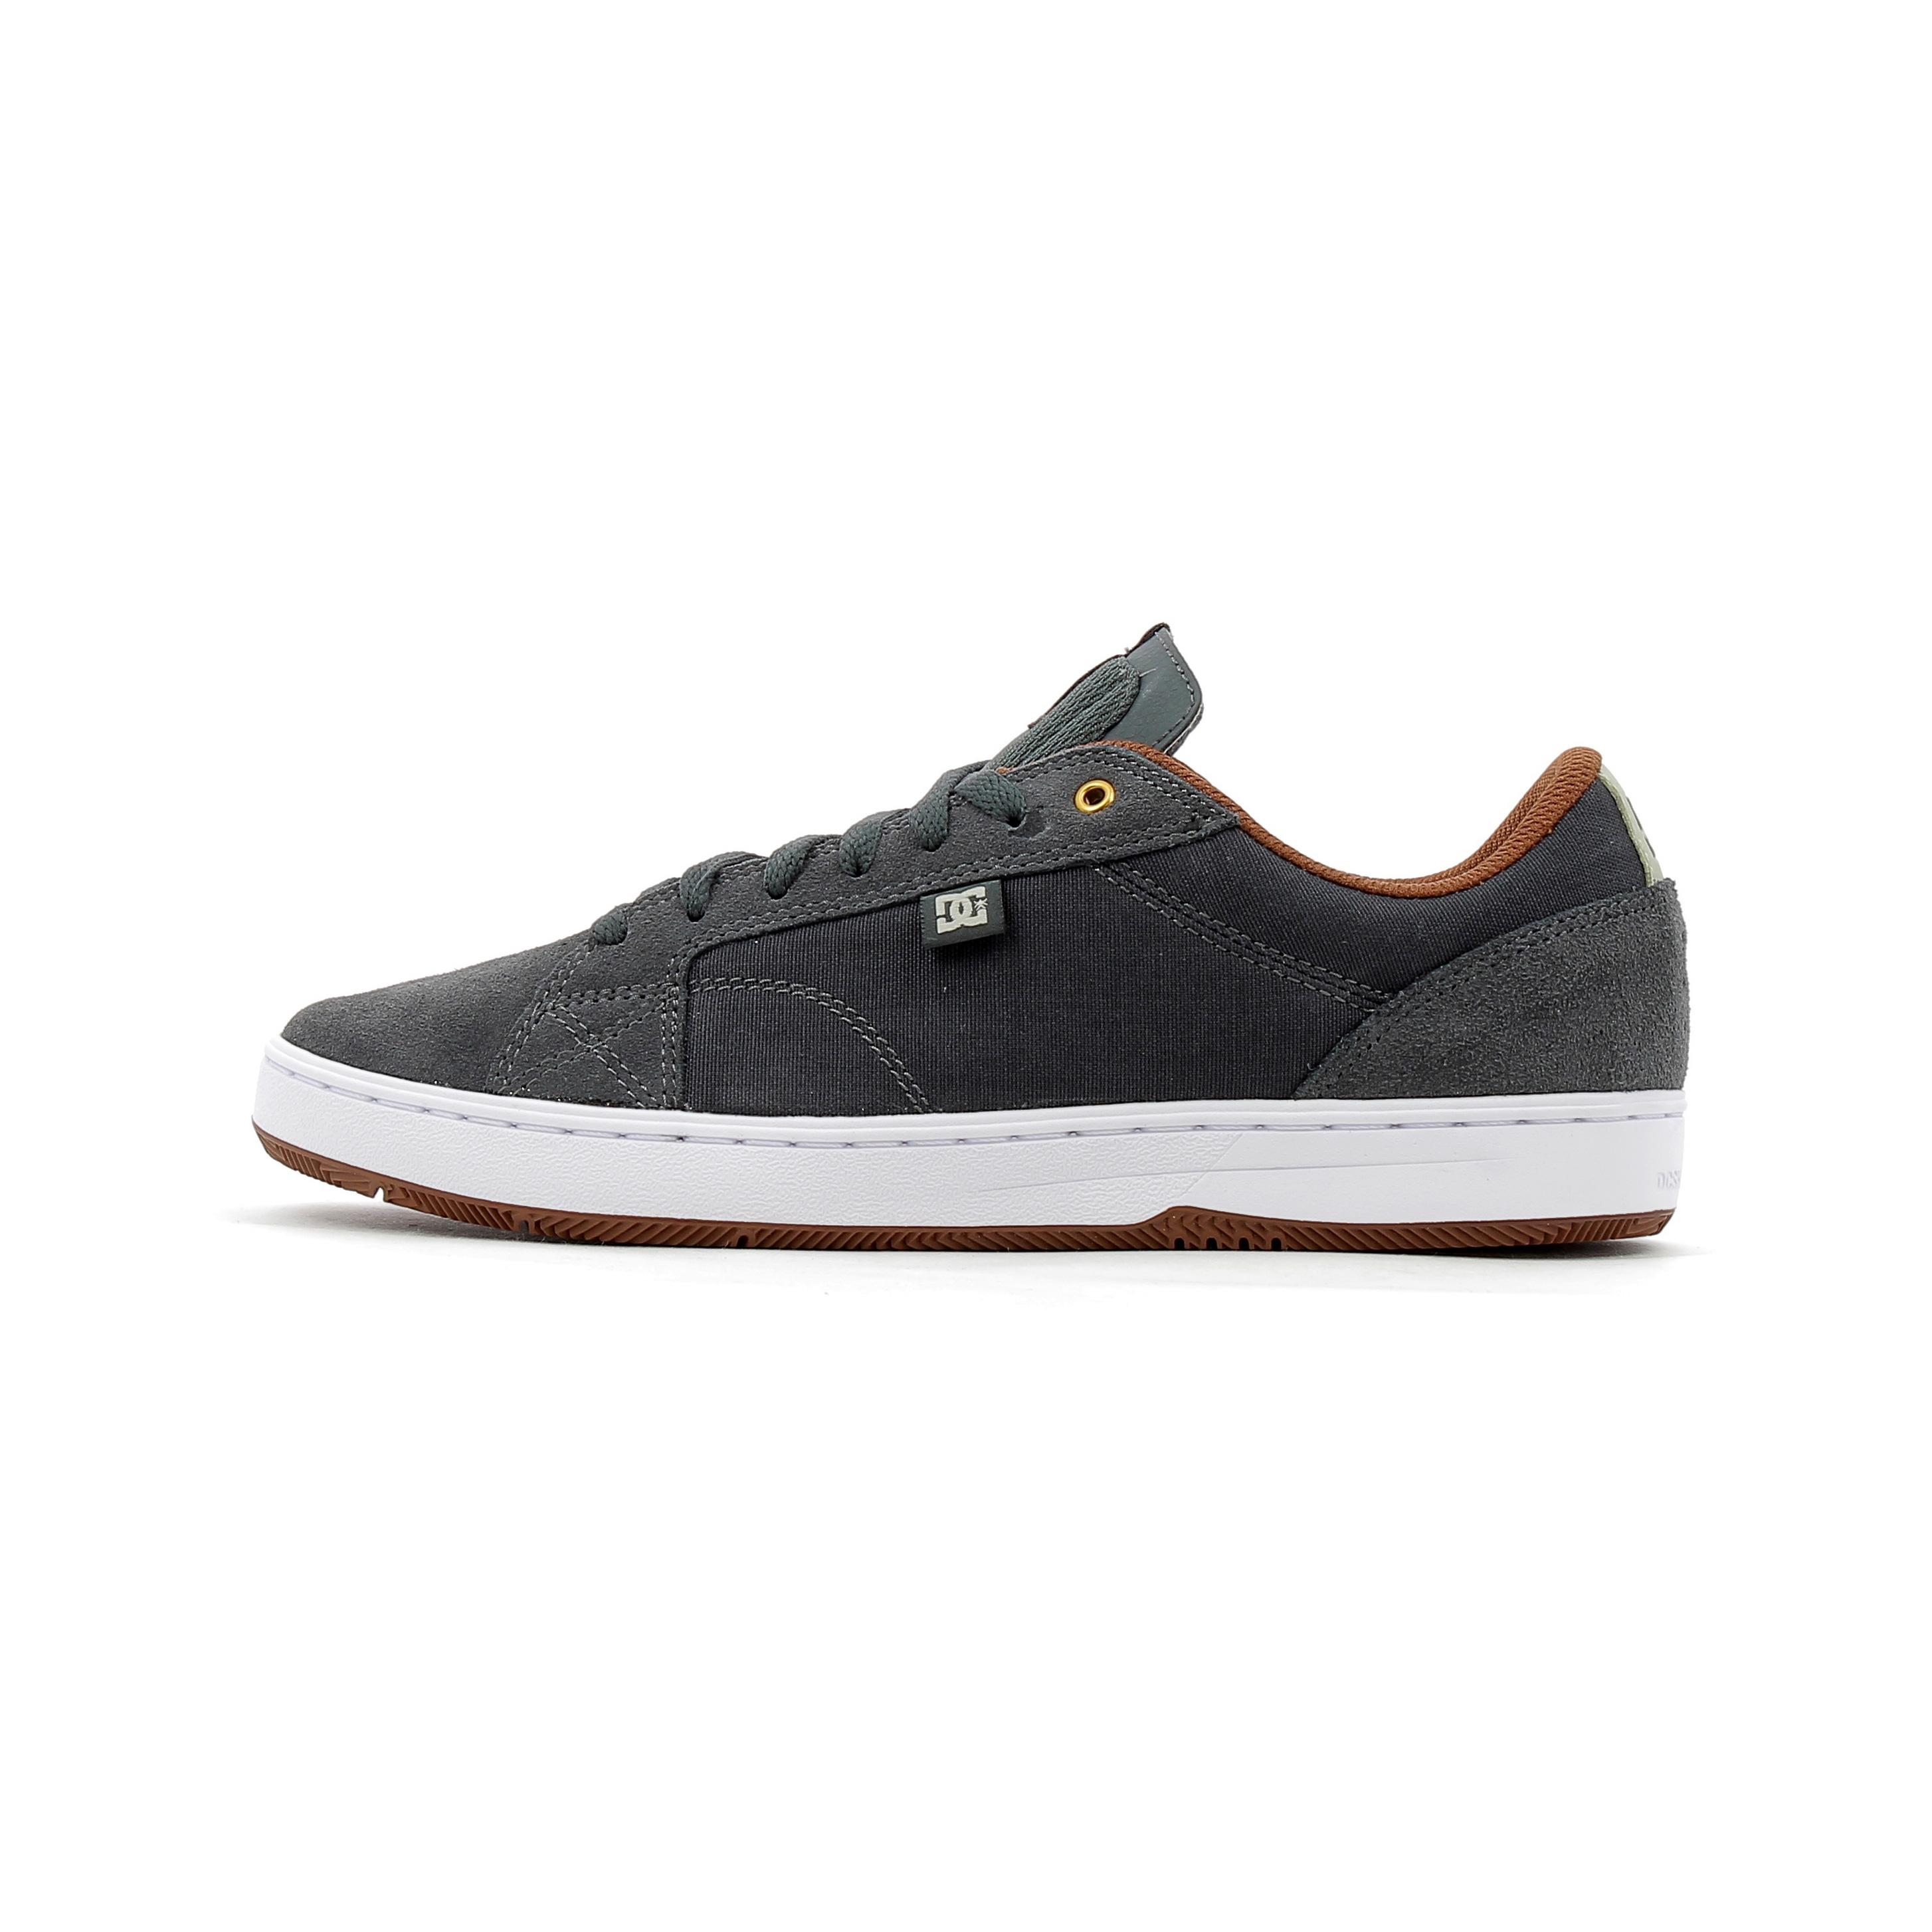 Dc Basses Astor Baskets Shoes M H9EDW2I